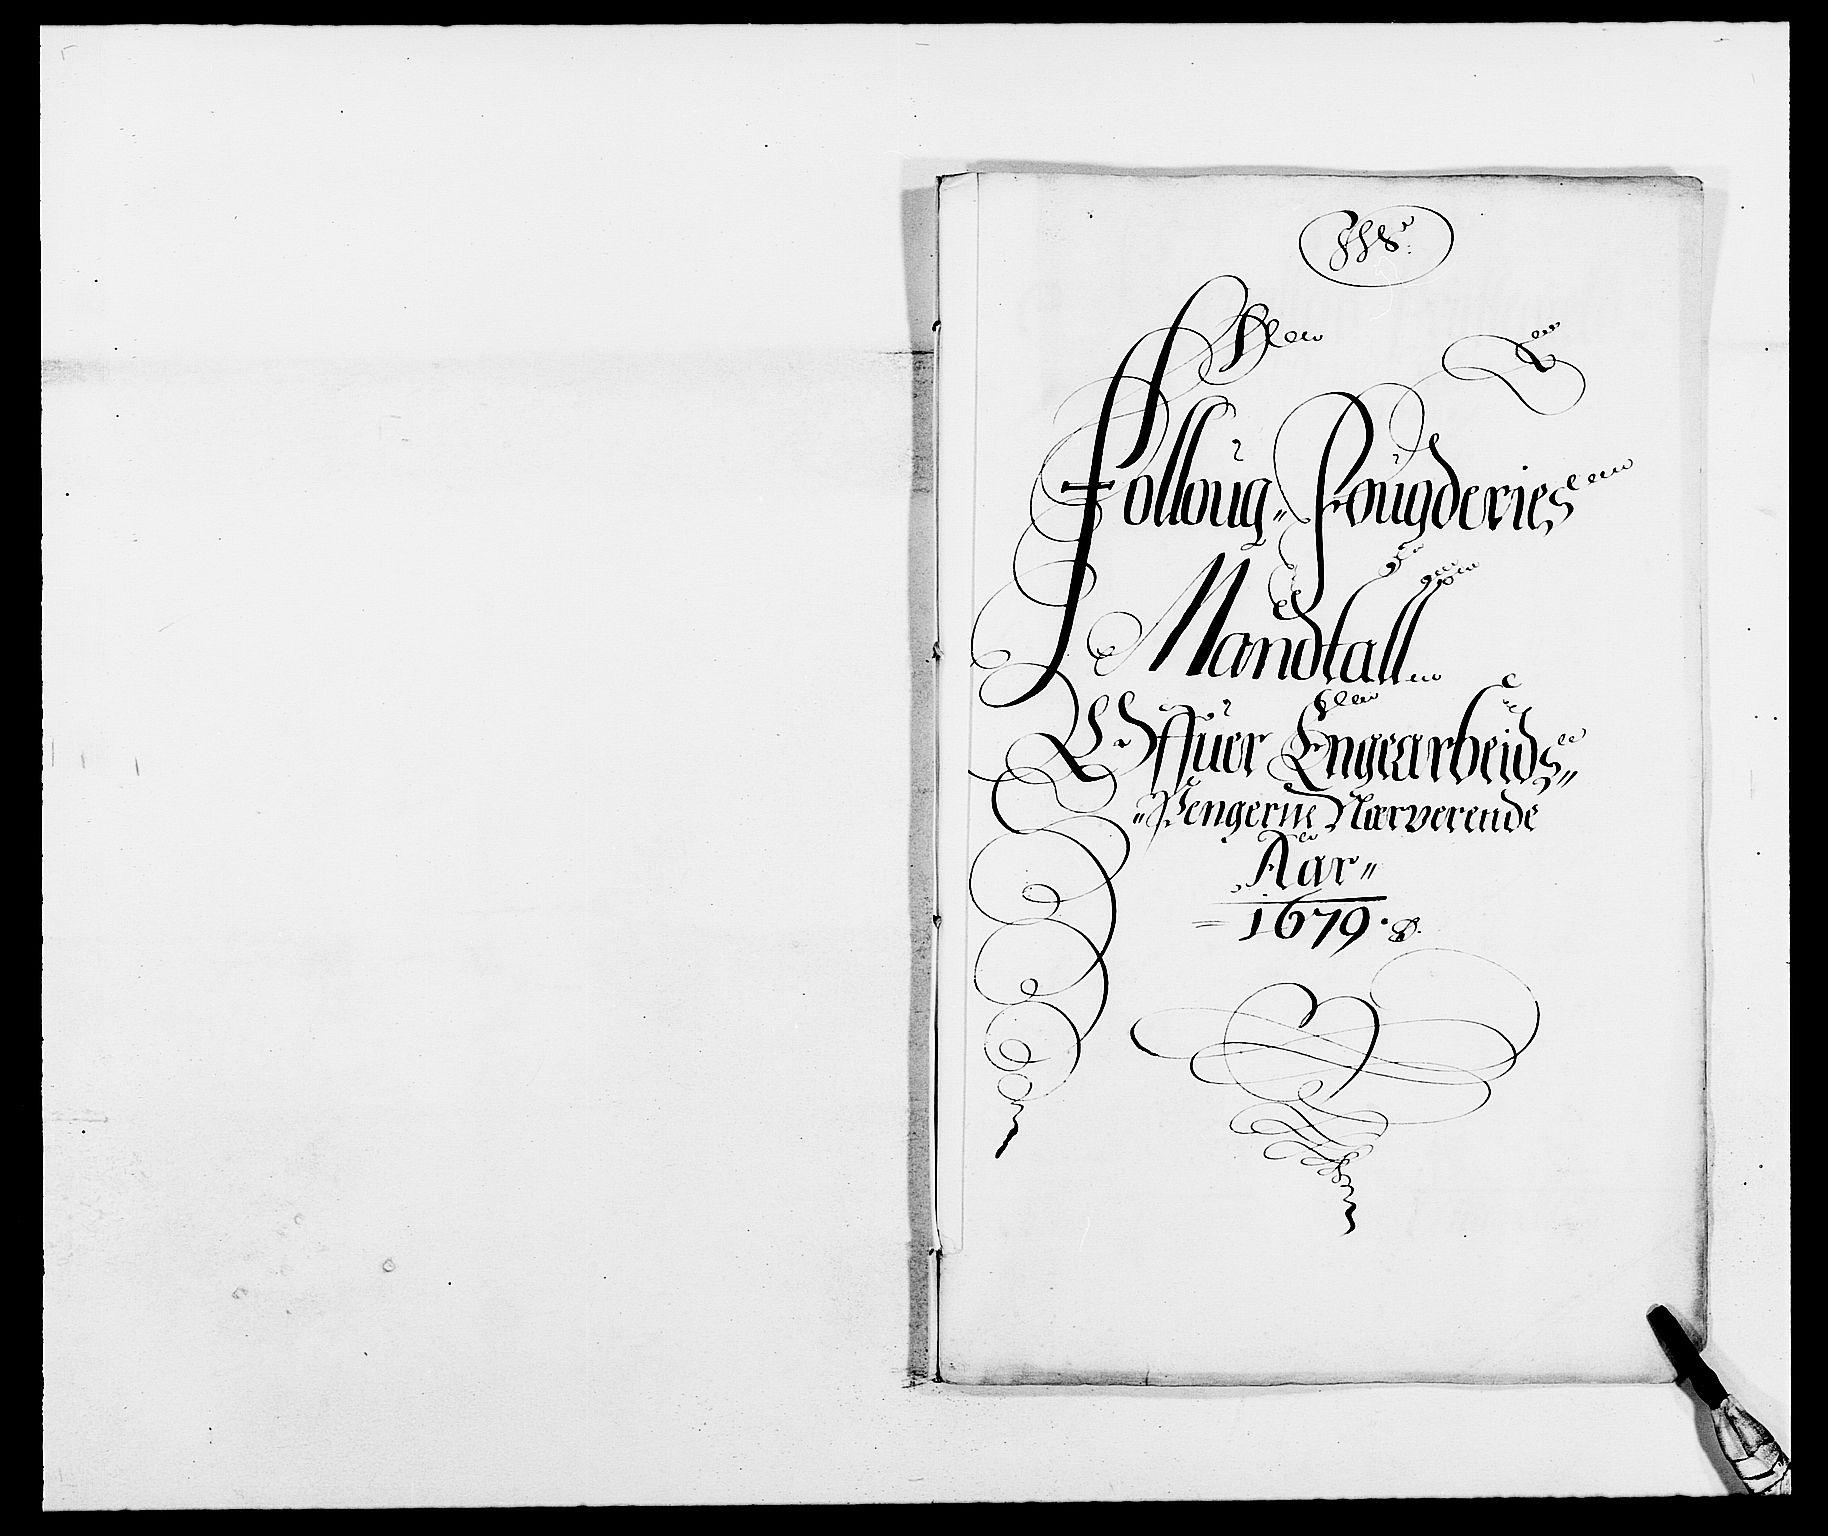 RA, Rentekammeret inntil 1814, Reviderte regnskaper, Fogderegnskap, R09/L0428: Fogderegnskap Follo, 1679, s. 155